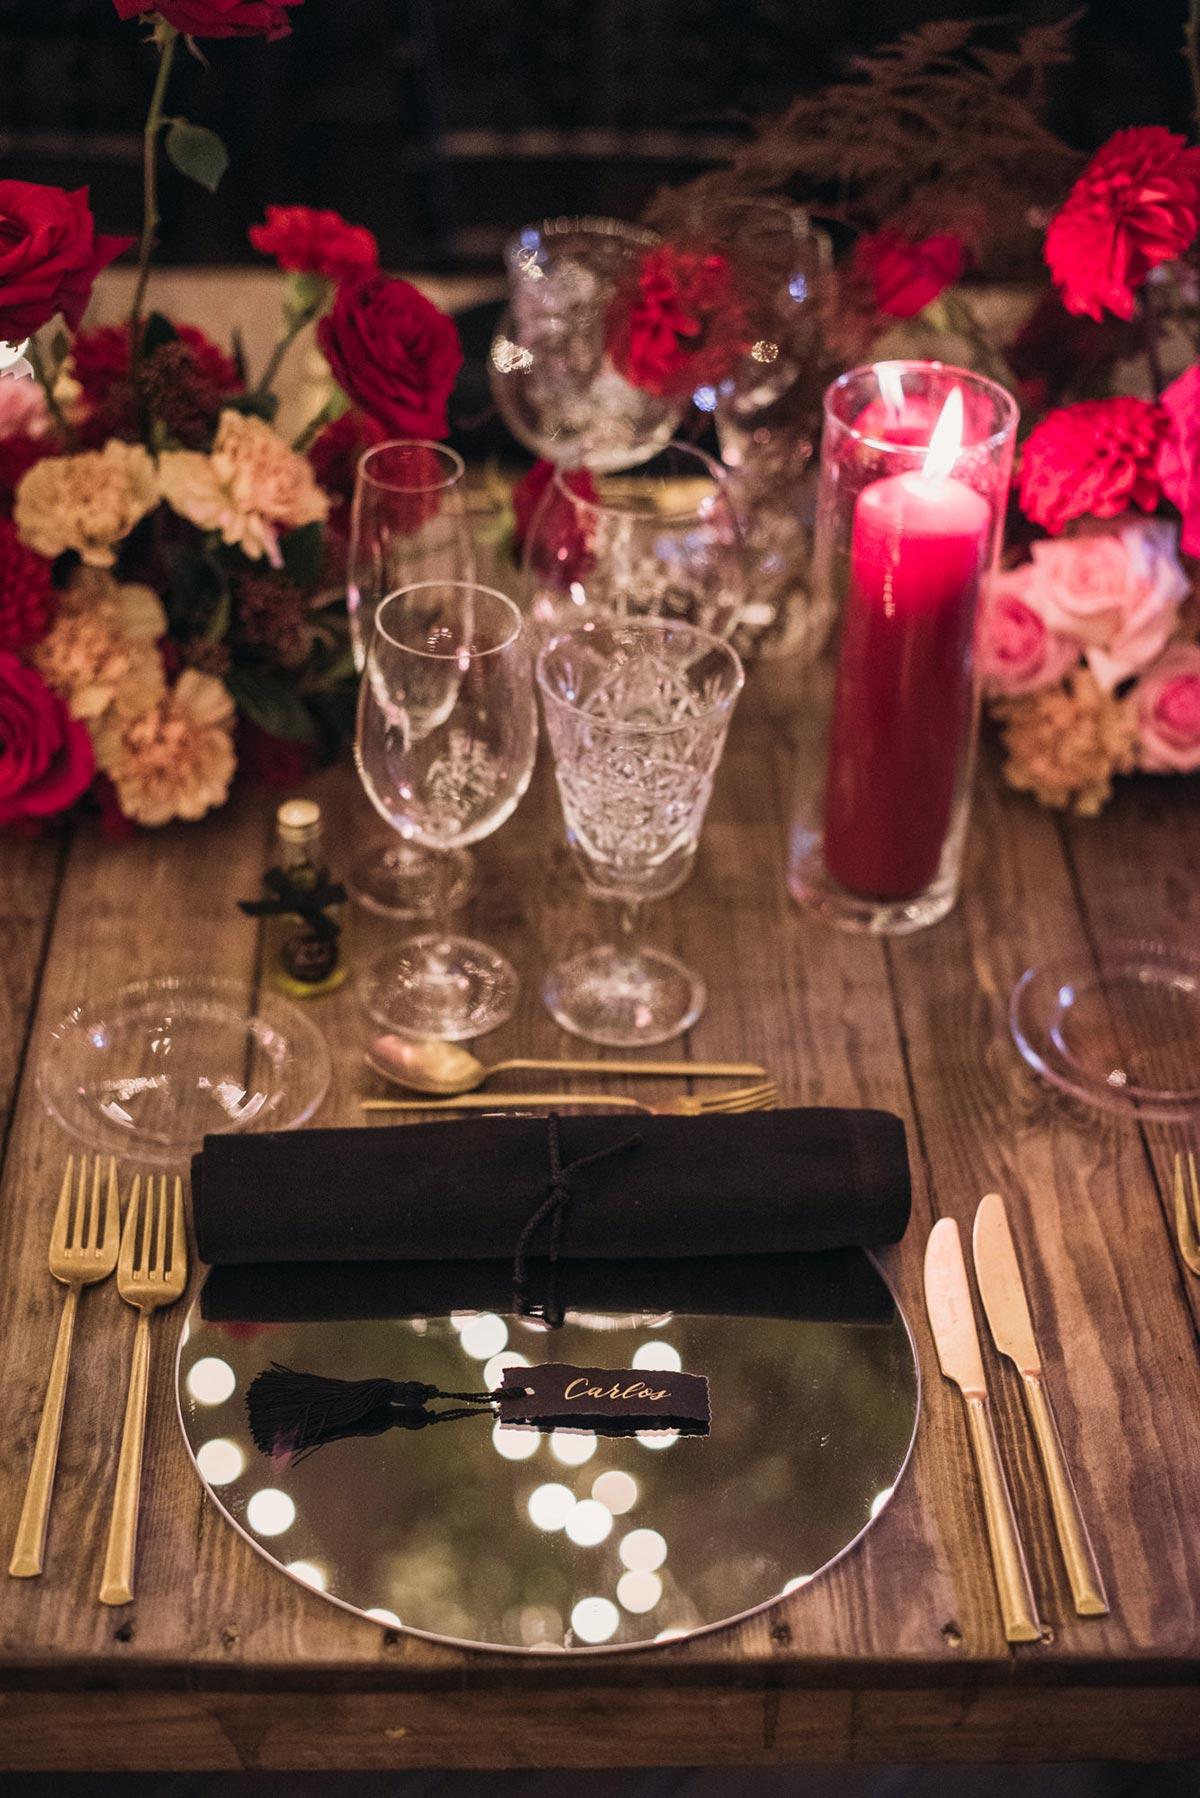 Boda de noche llena de luces | iluminacion set de mesa | Bodas de Cuento